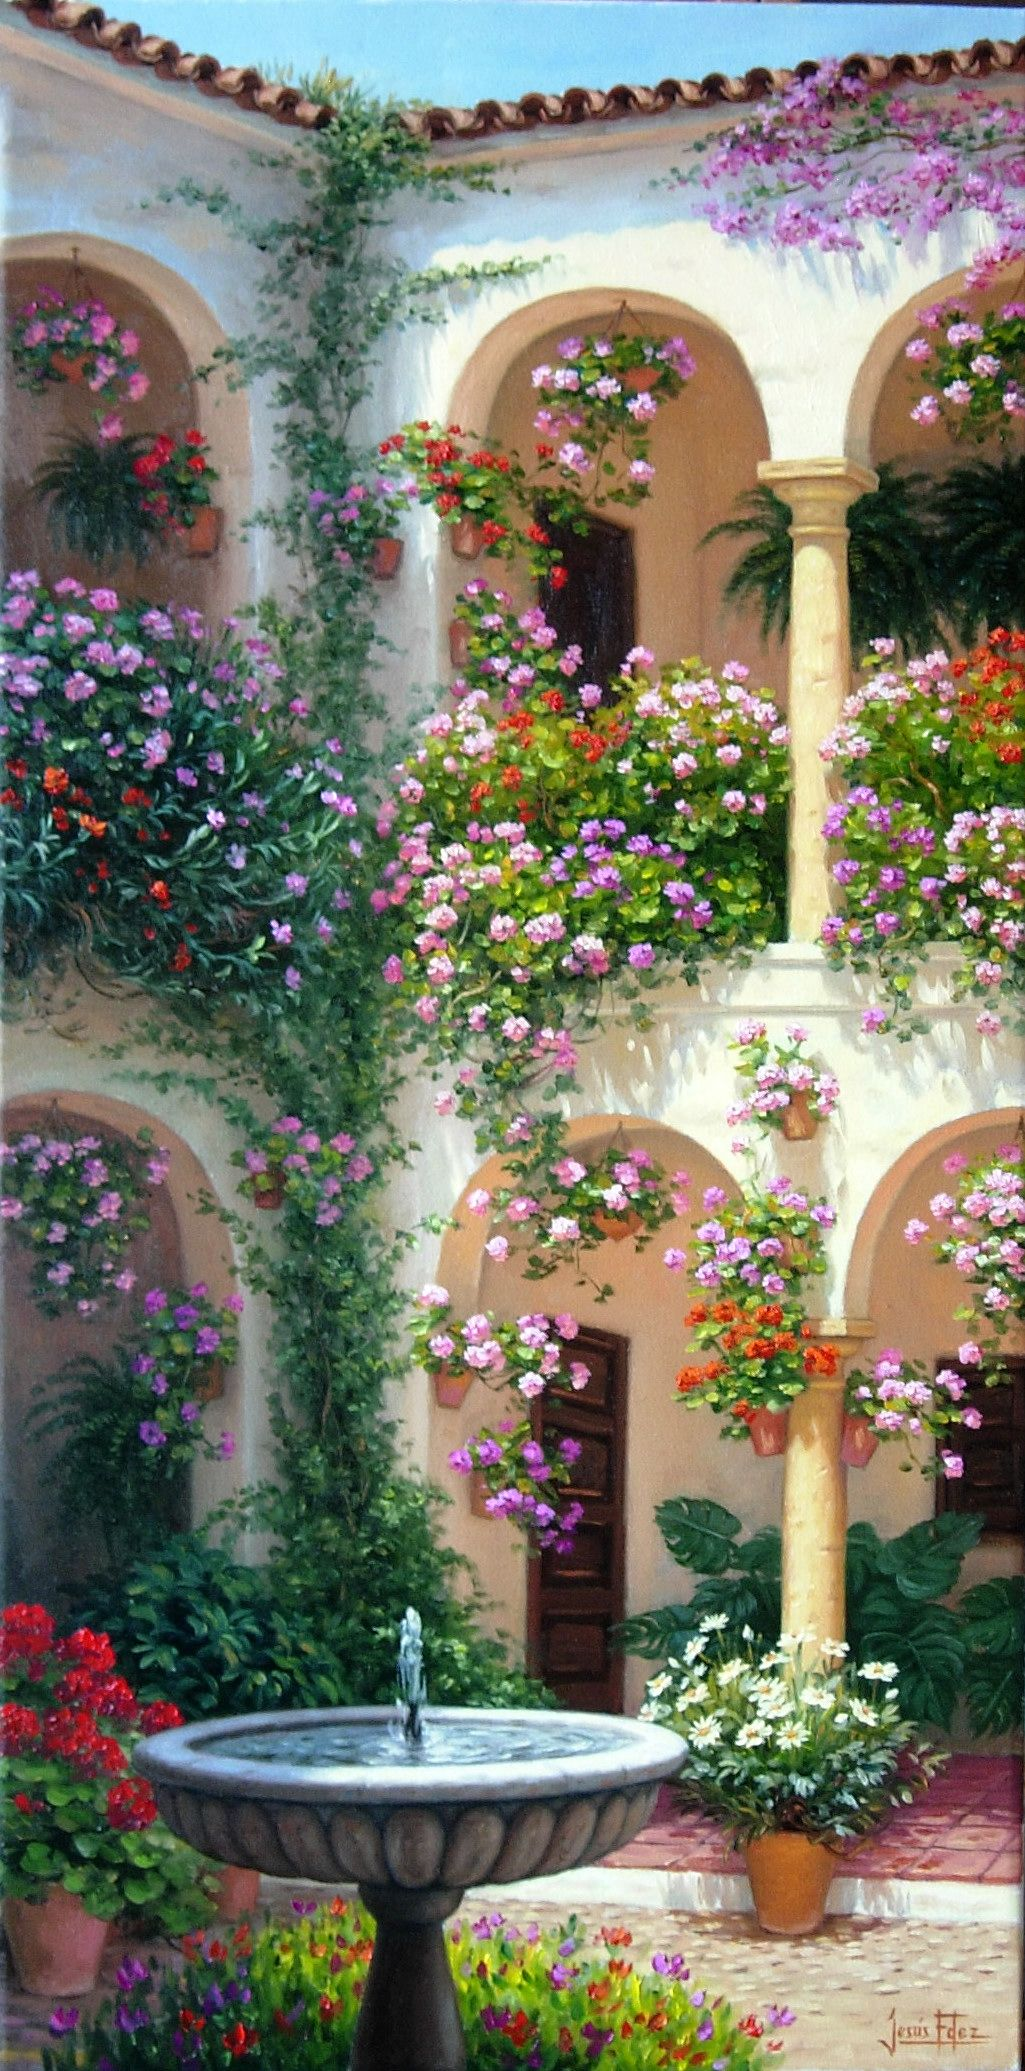 Patio cordob s andalucia espa a dibujo pinterest - Imagenes de patios andaluces ...